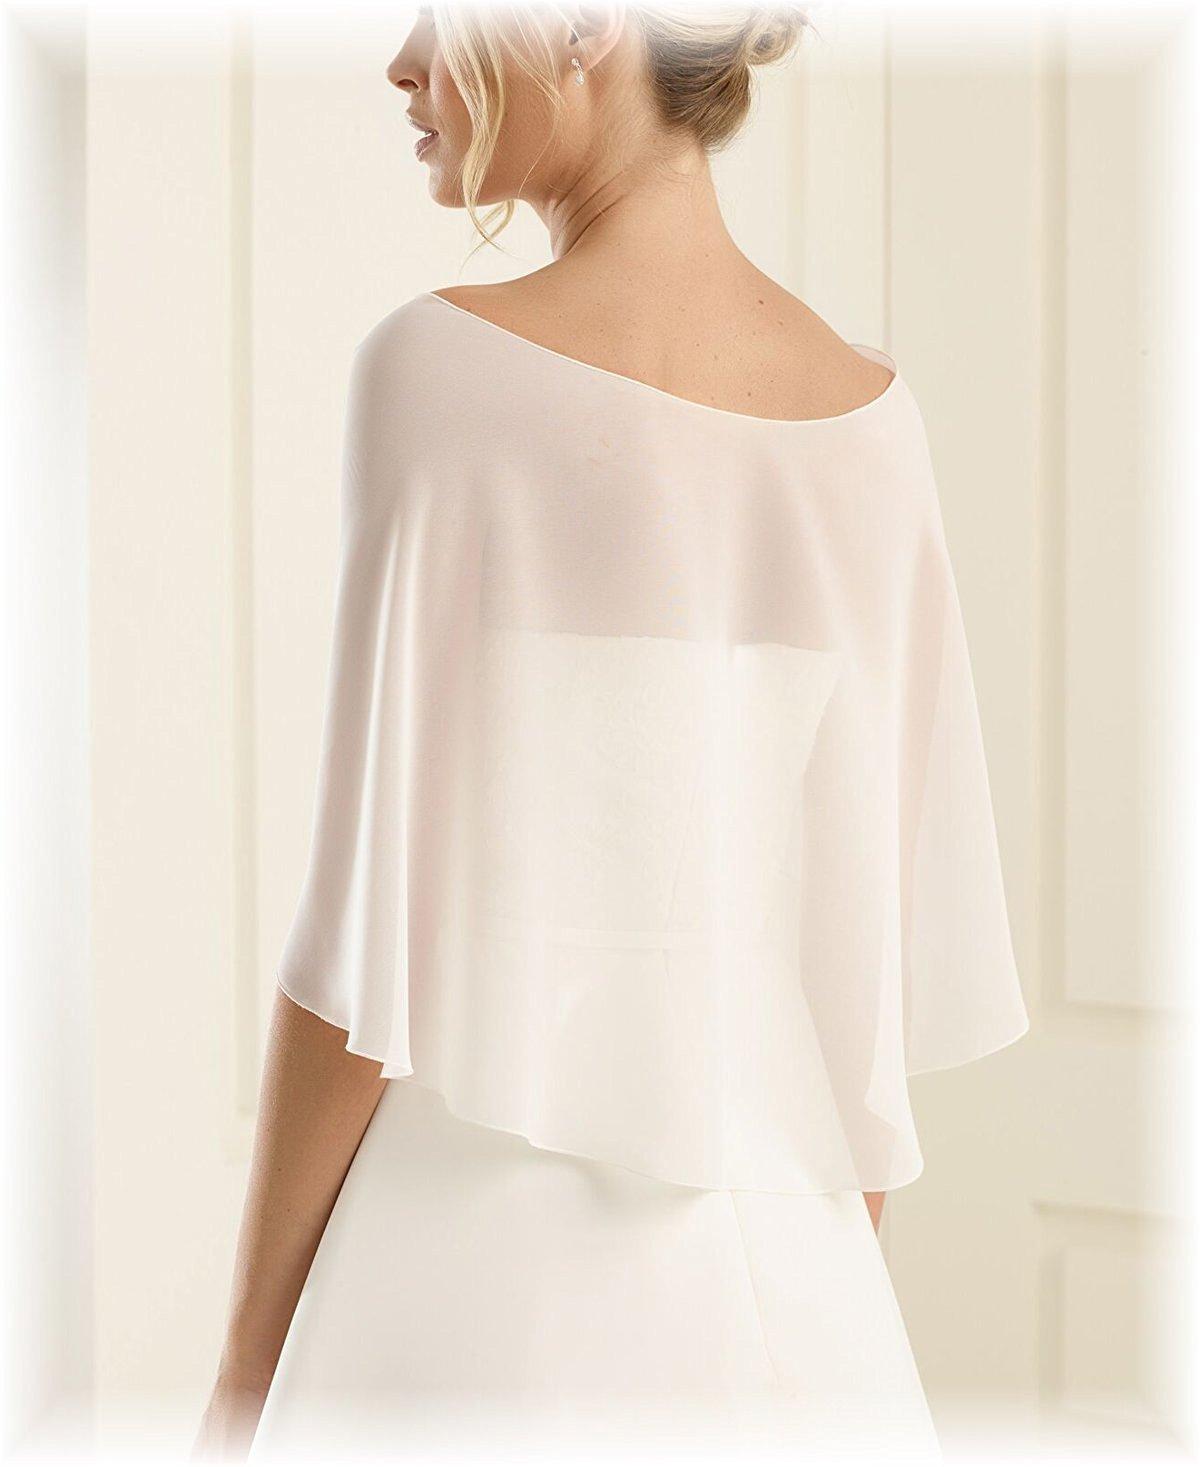 Hot Dresses Chiffon Bridal Evening Scarves Wraps Shawls for Bridesmaid Prom Wedding (Ivory)